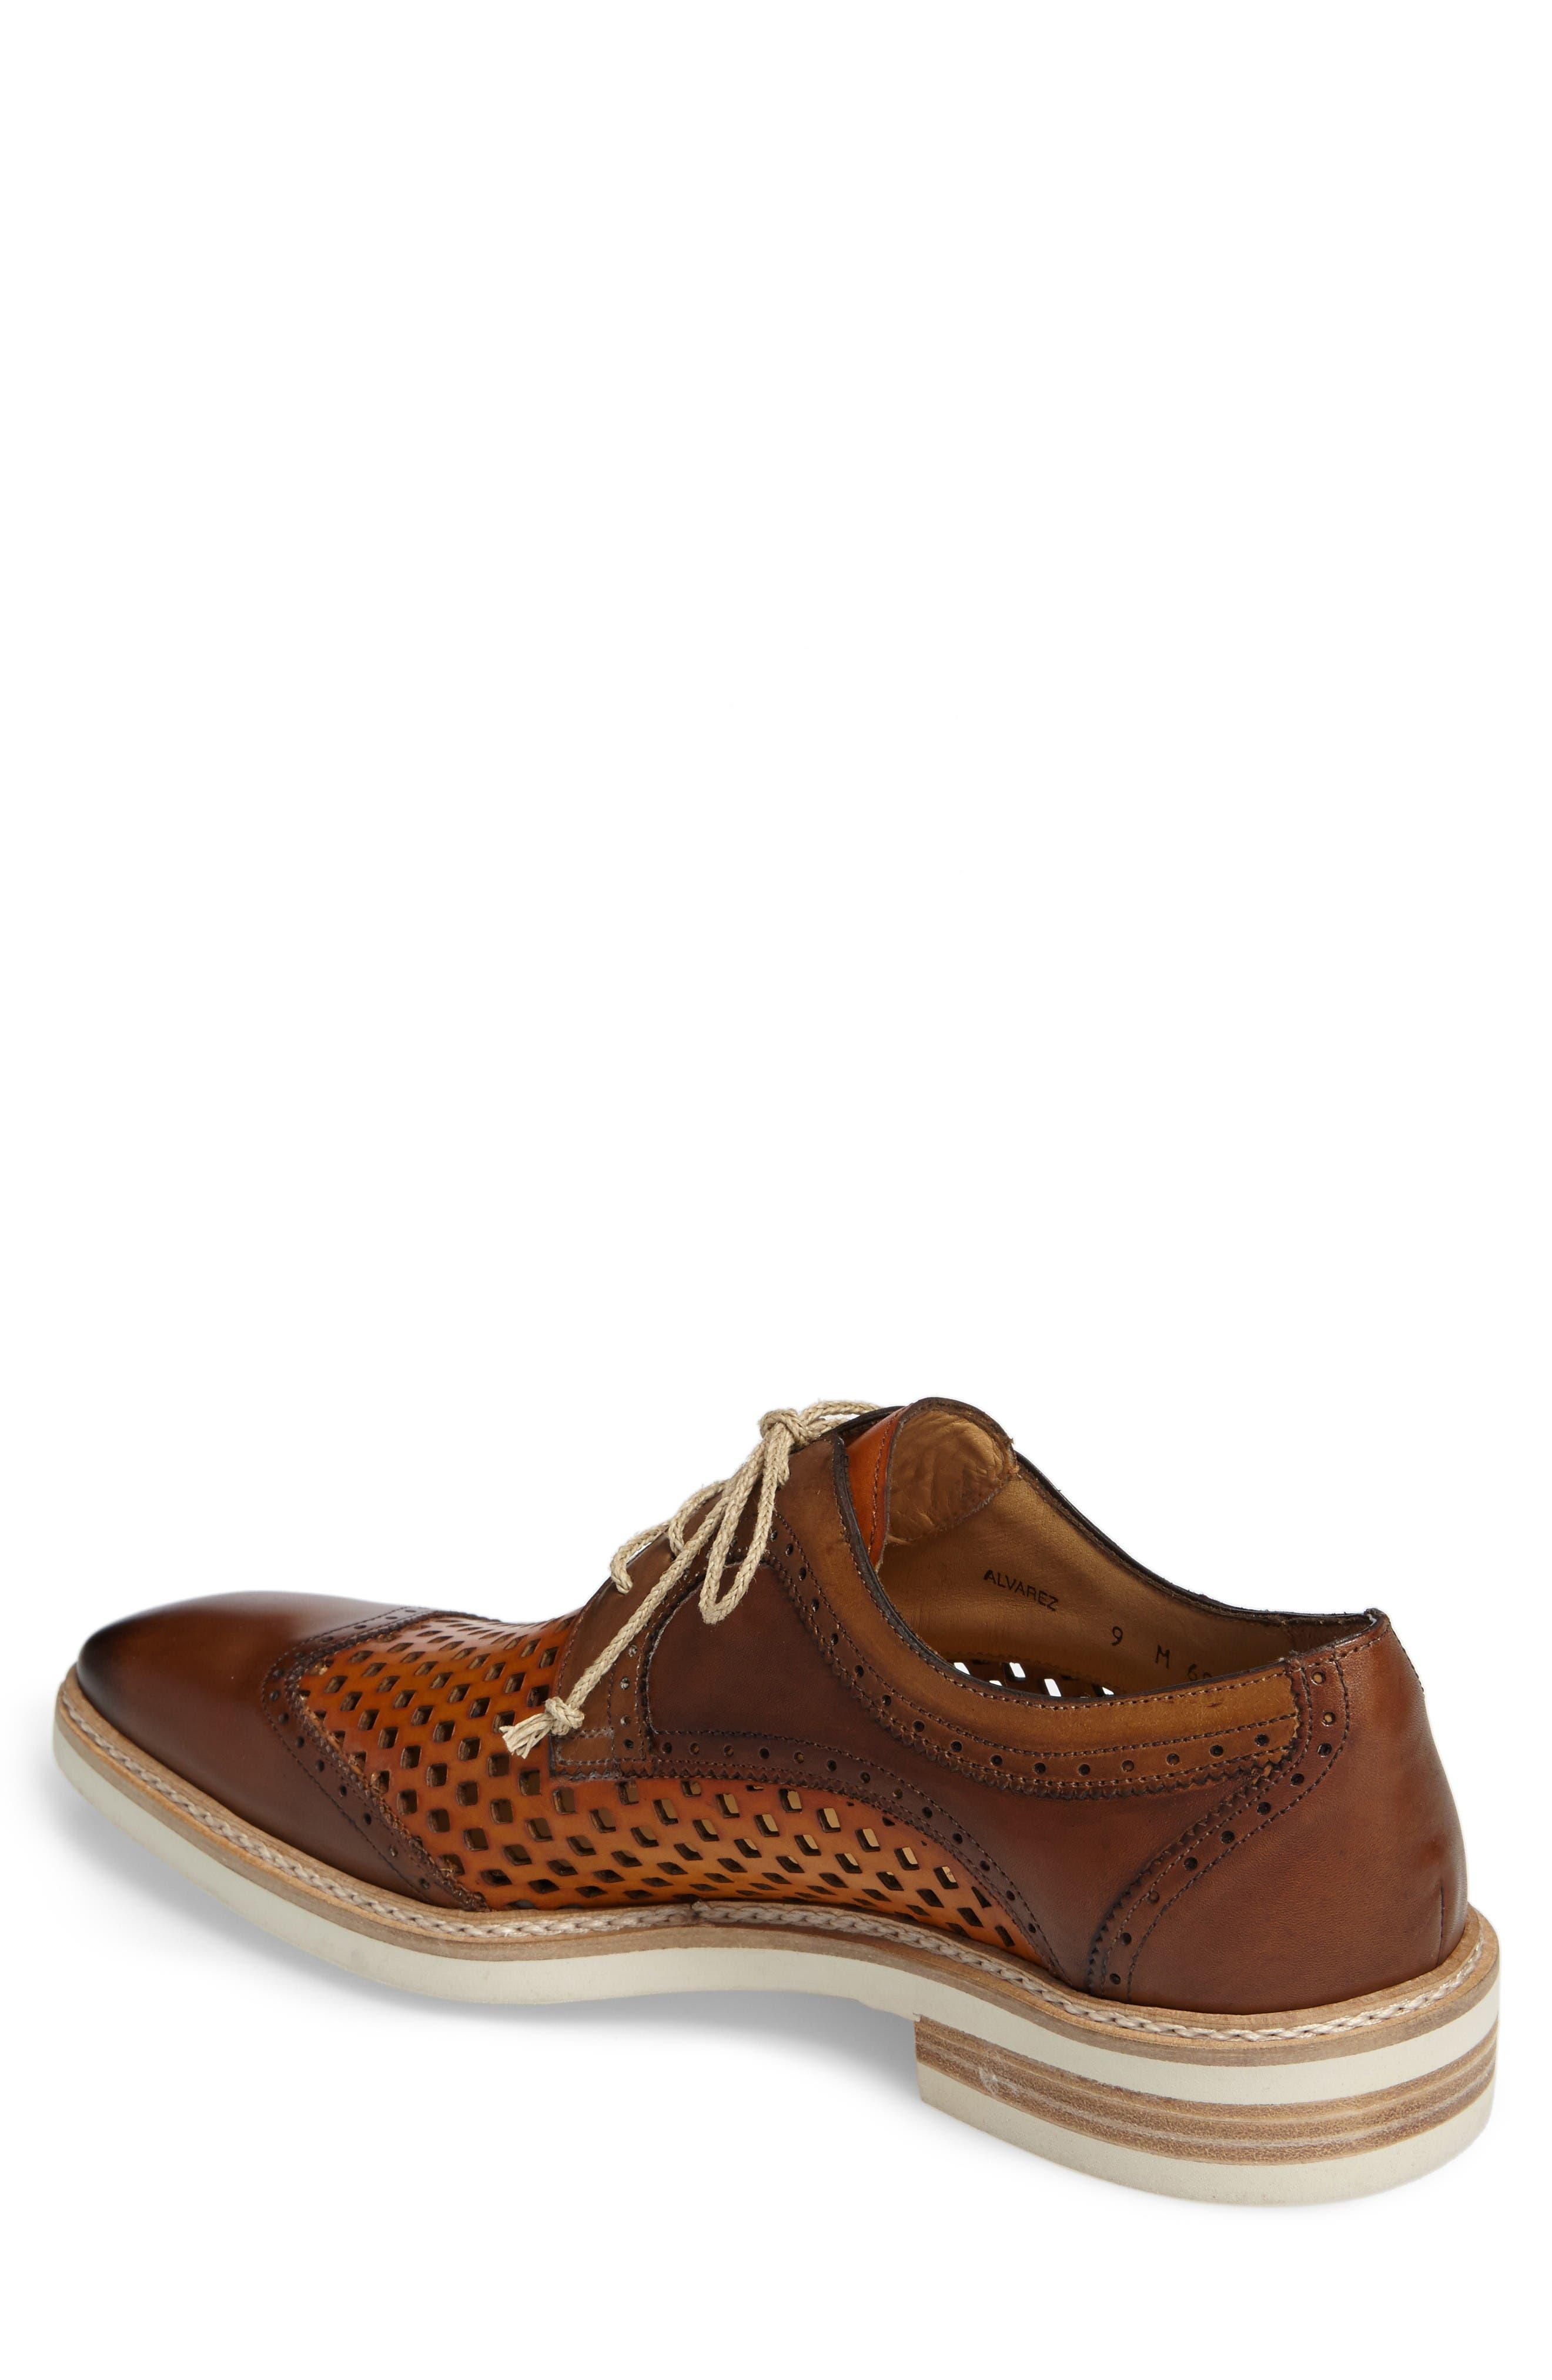 Alvarez Spectator Shoe,                             Alternate thumbnail 2, color,                             Cognac Multi Leather